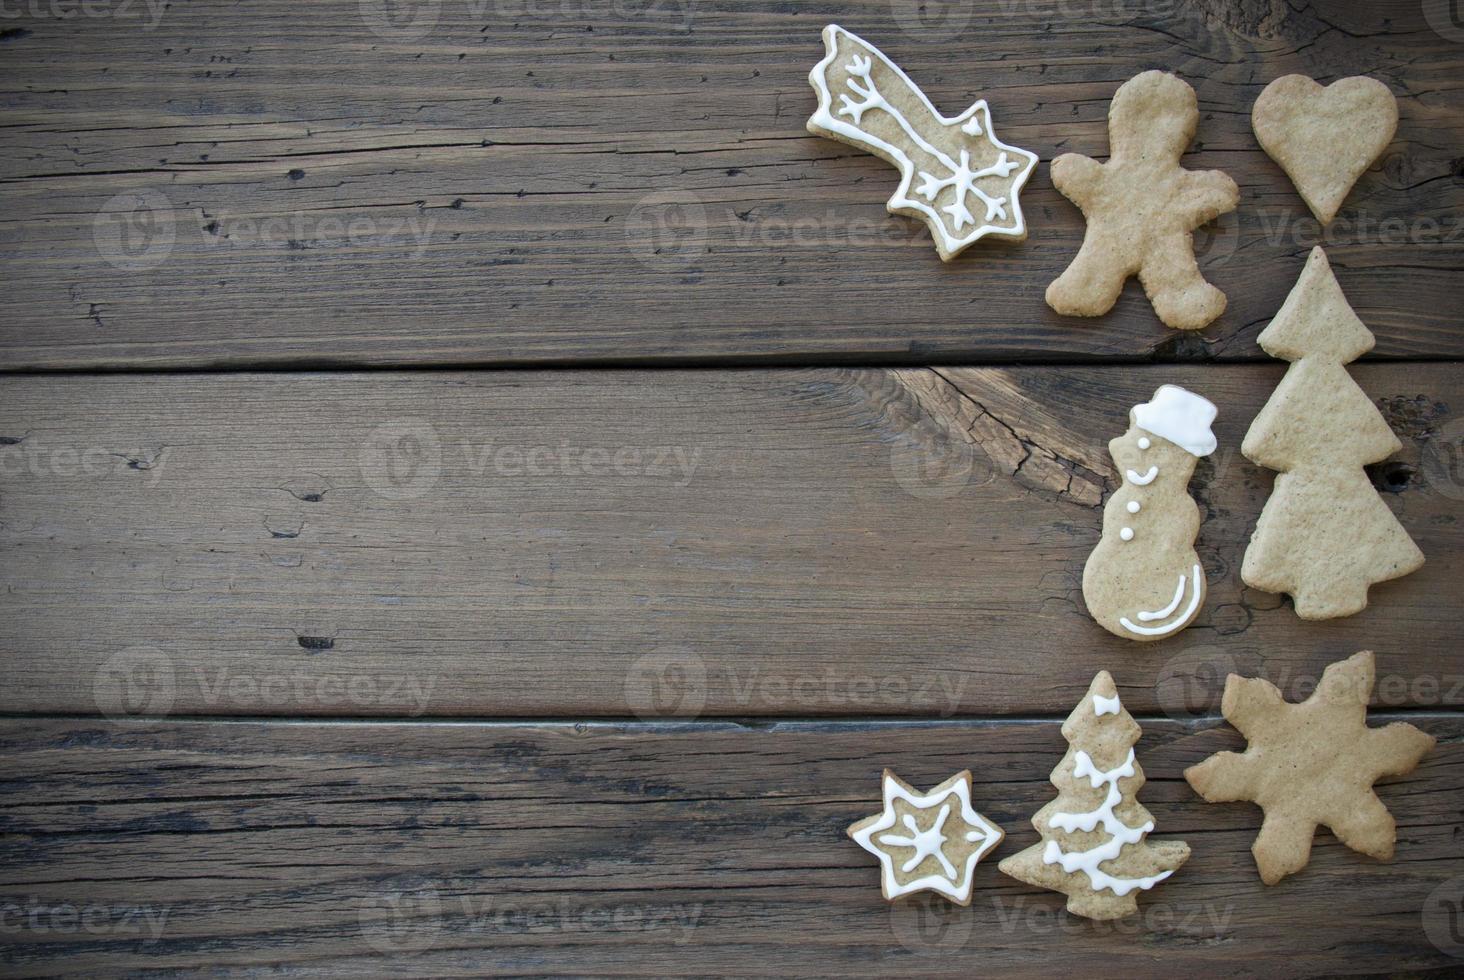 ingericht gemberbrood cookies op houten plank foto